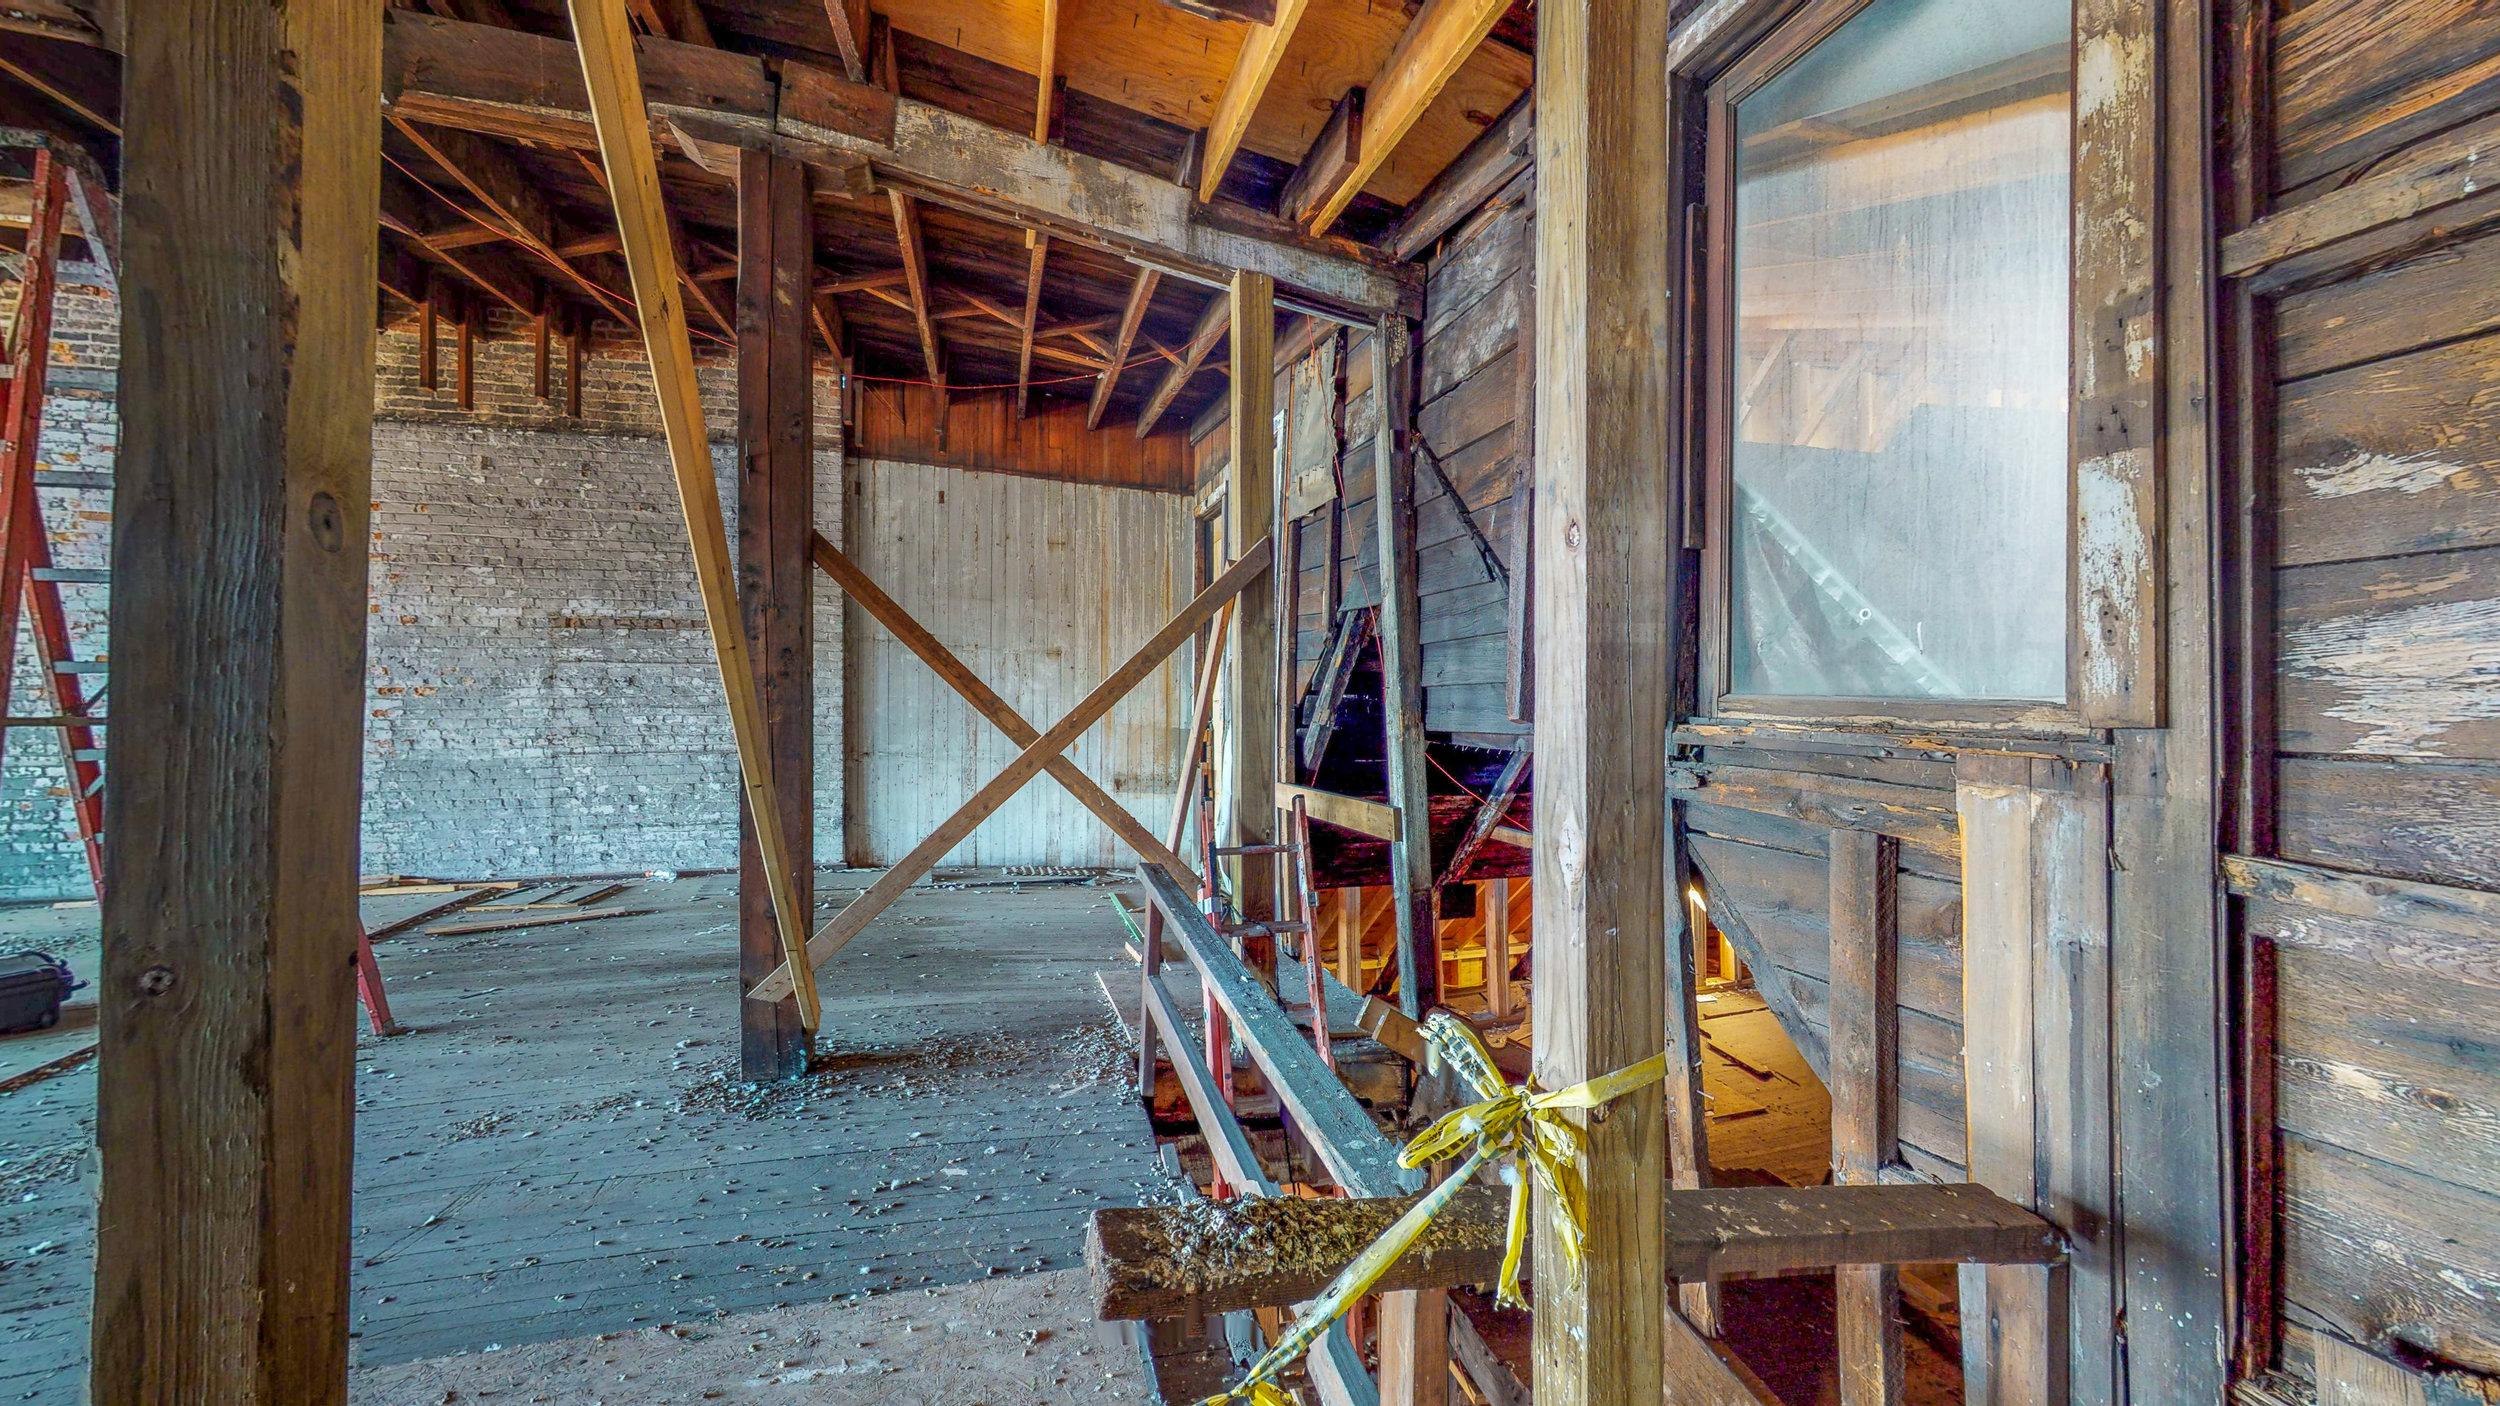 The-Van-Ostrande-Radliff-House-at-48-Hudson-08292019_131737.jpg